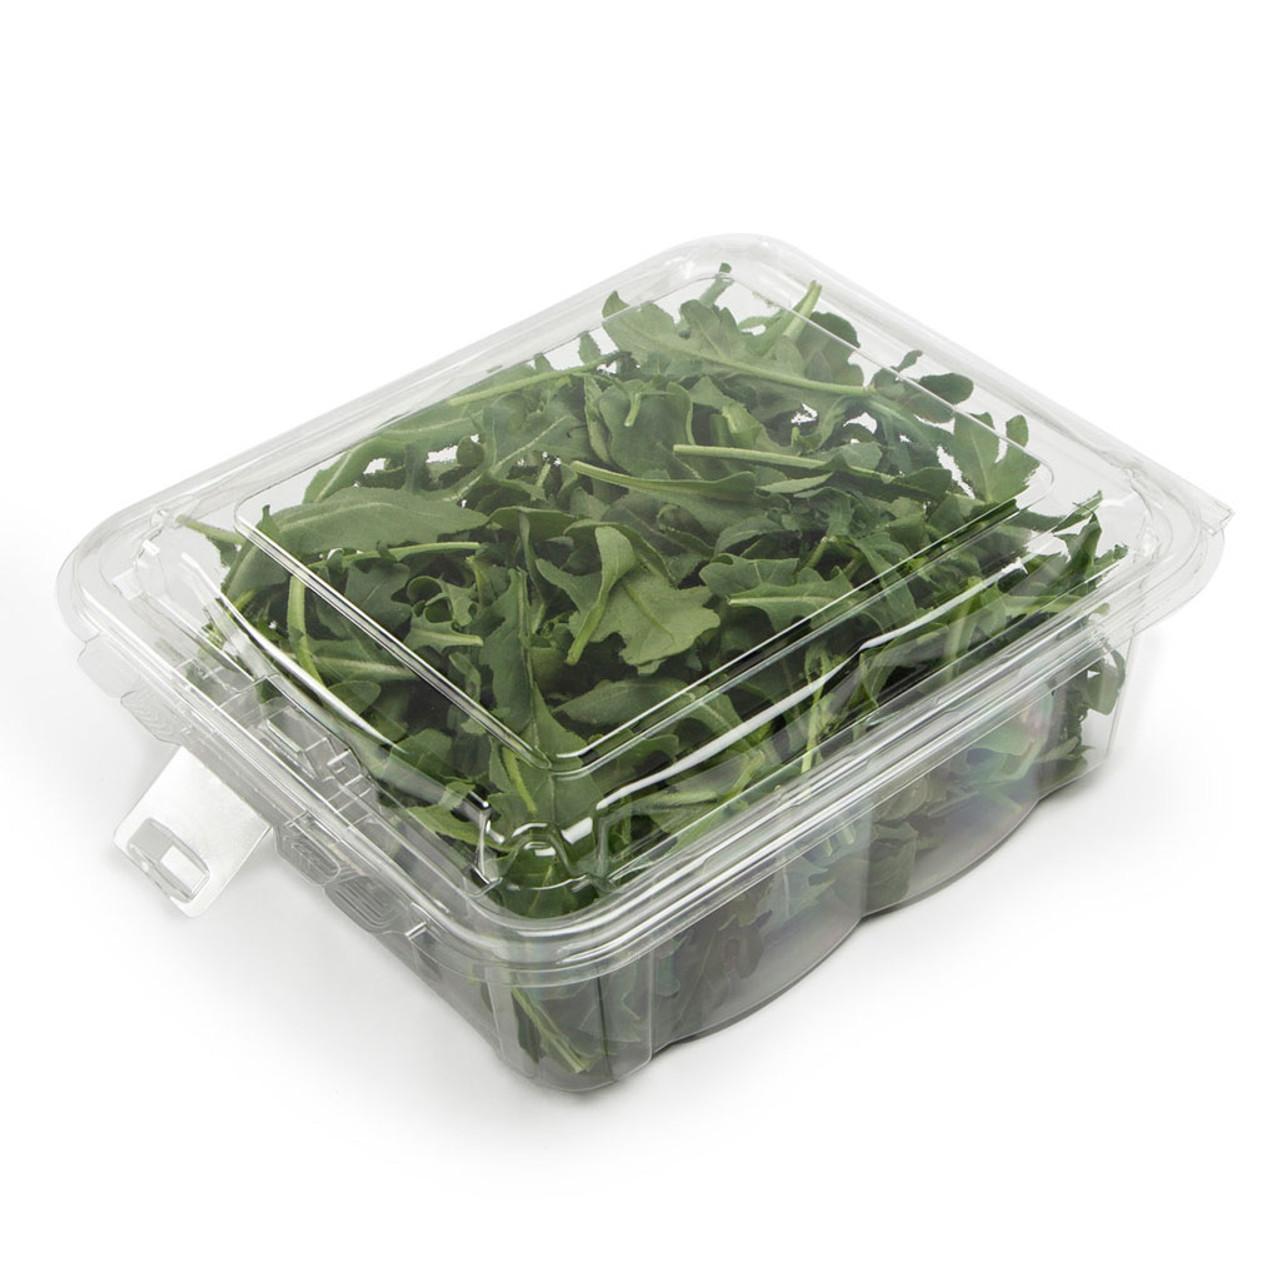 48oz Tamper Evident Salad Container